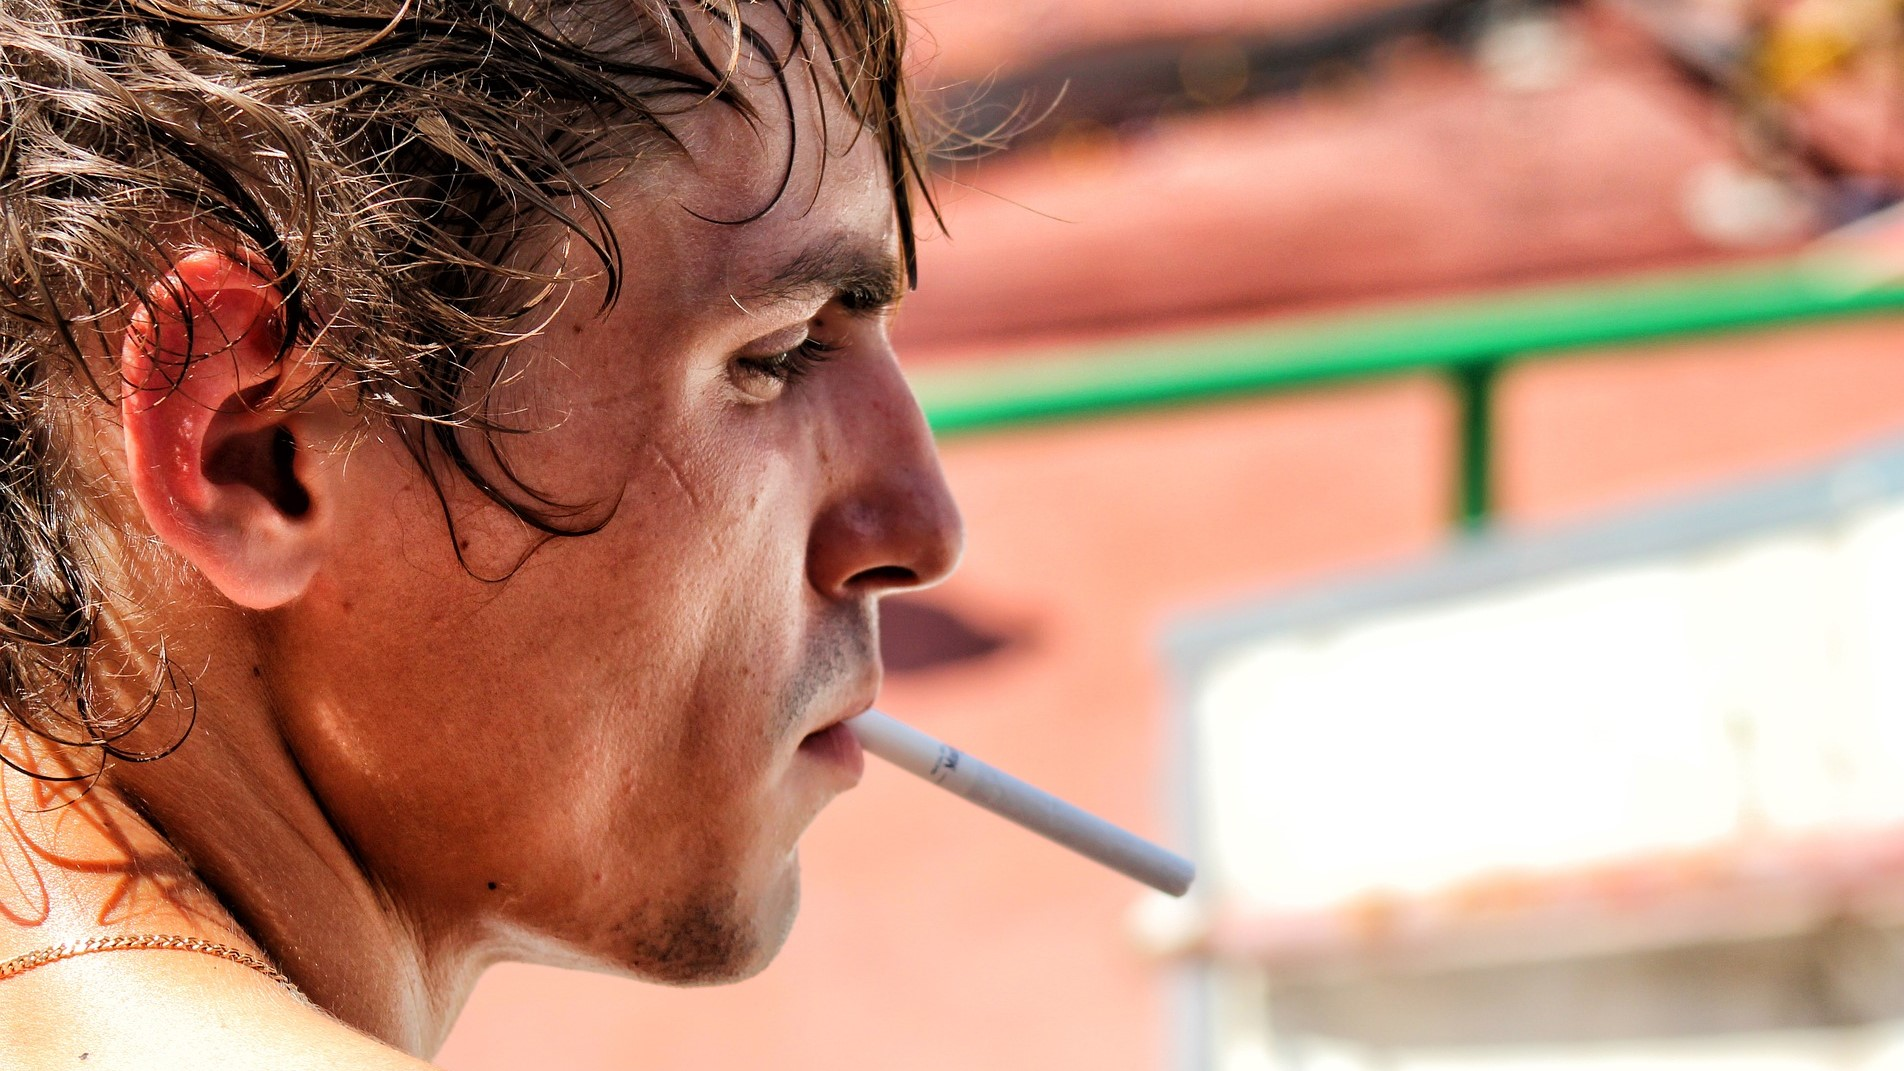 Smoking Statistics - Featured Image